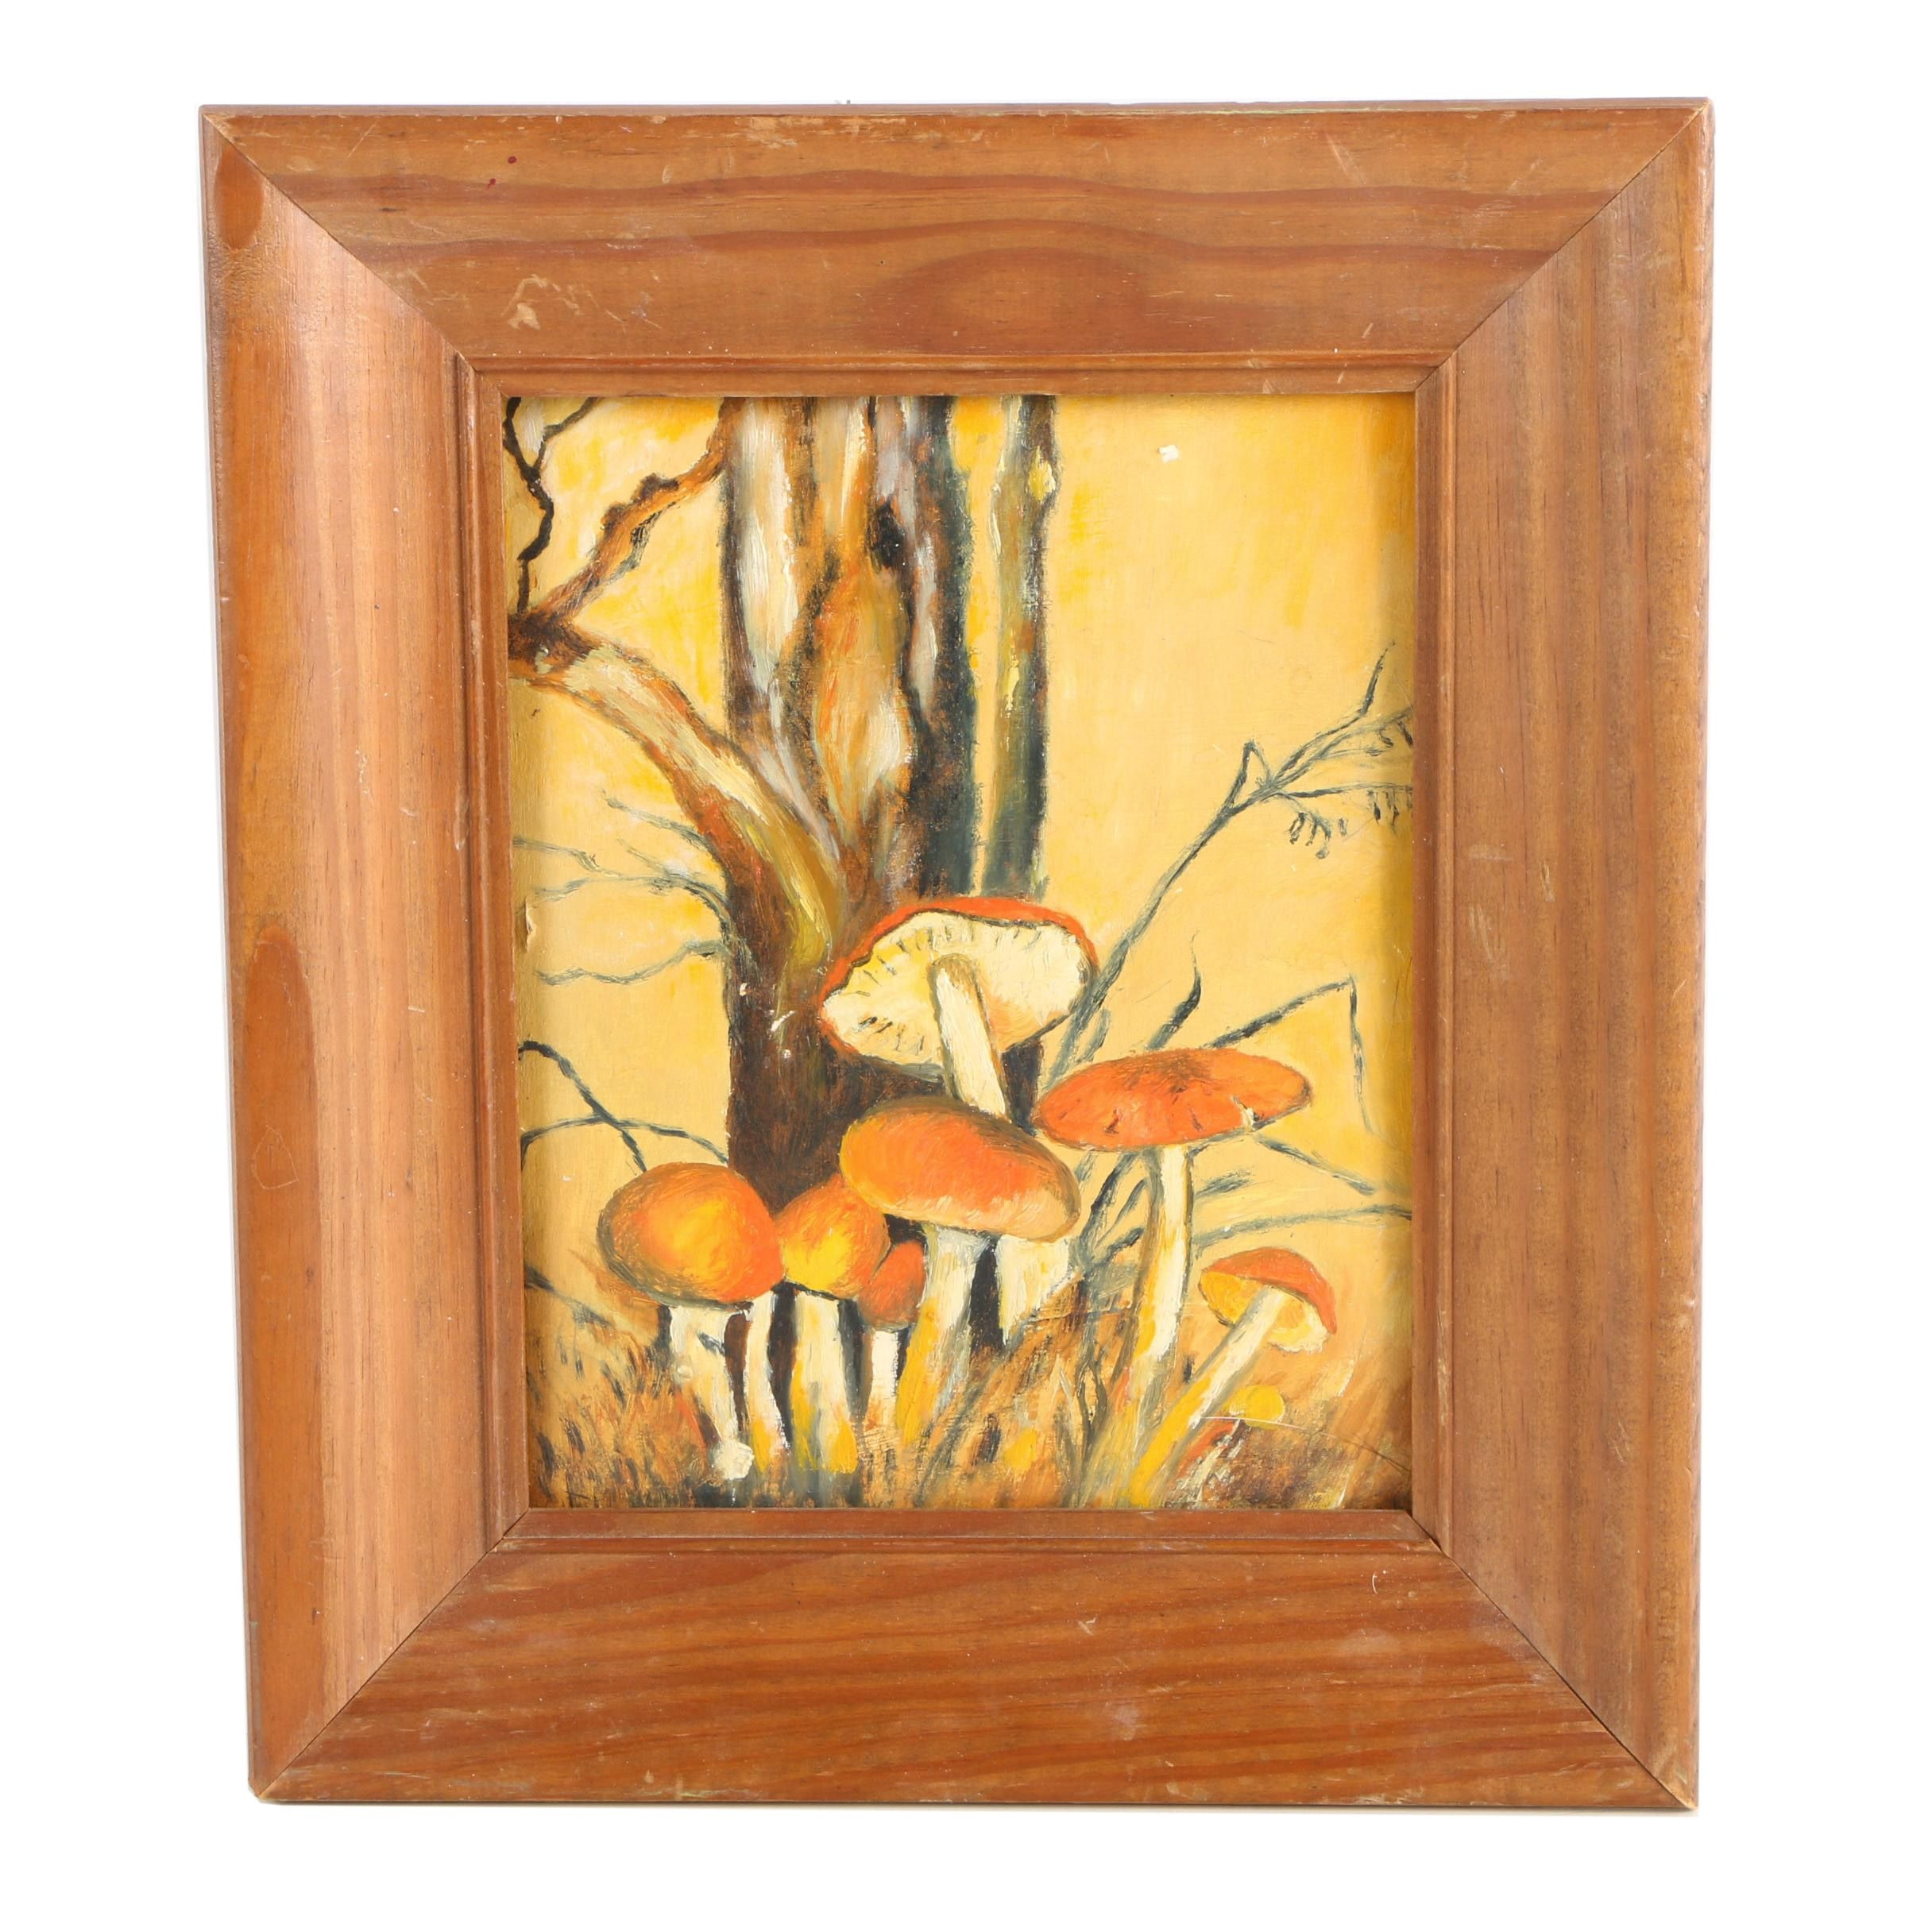 Oil Painting of Mushrooms